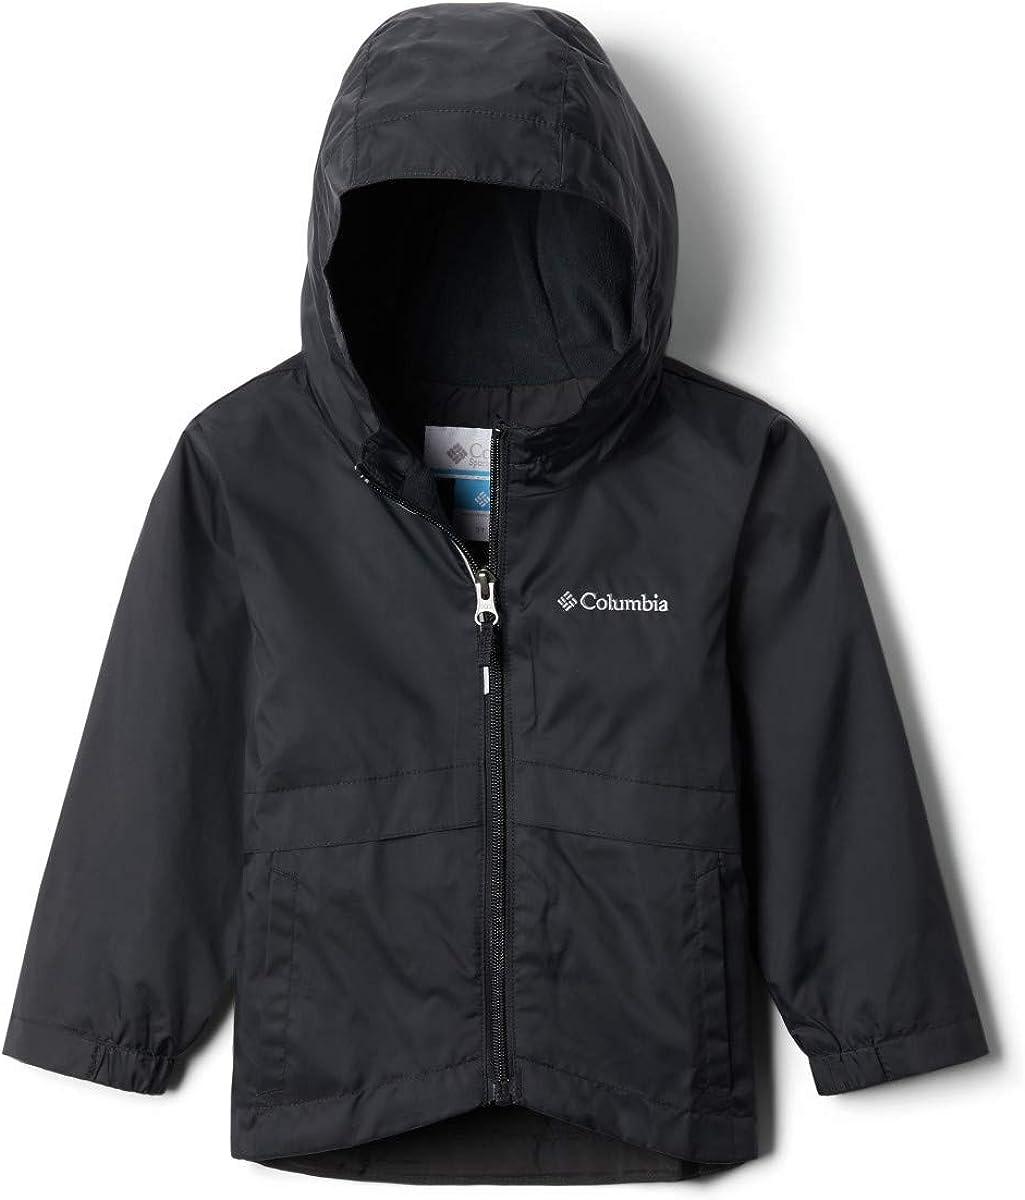 Columbia girls Rain-zilla Jacket